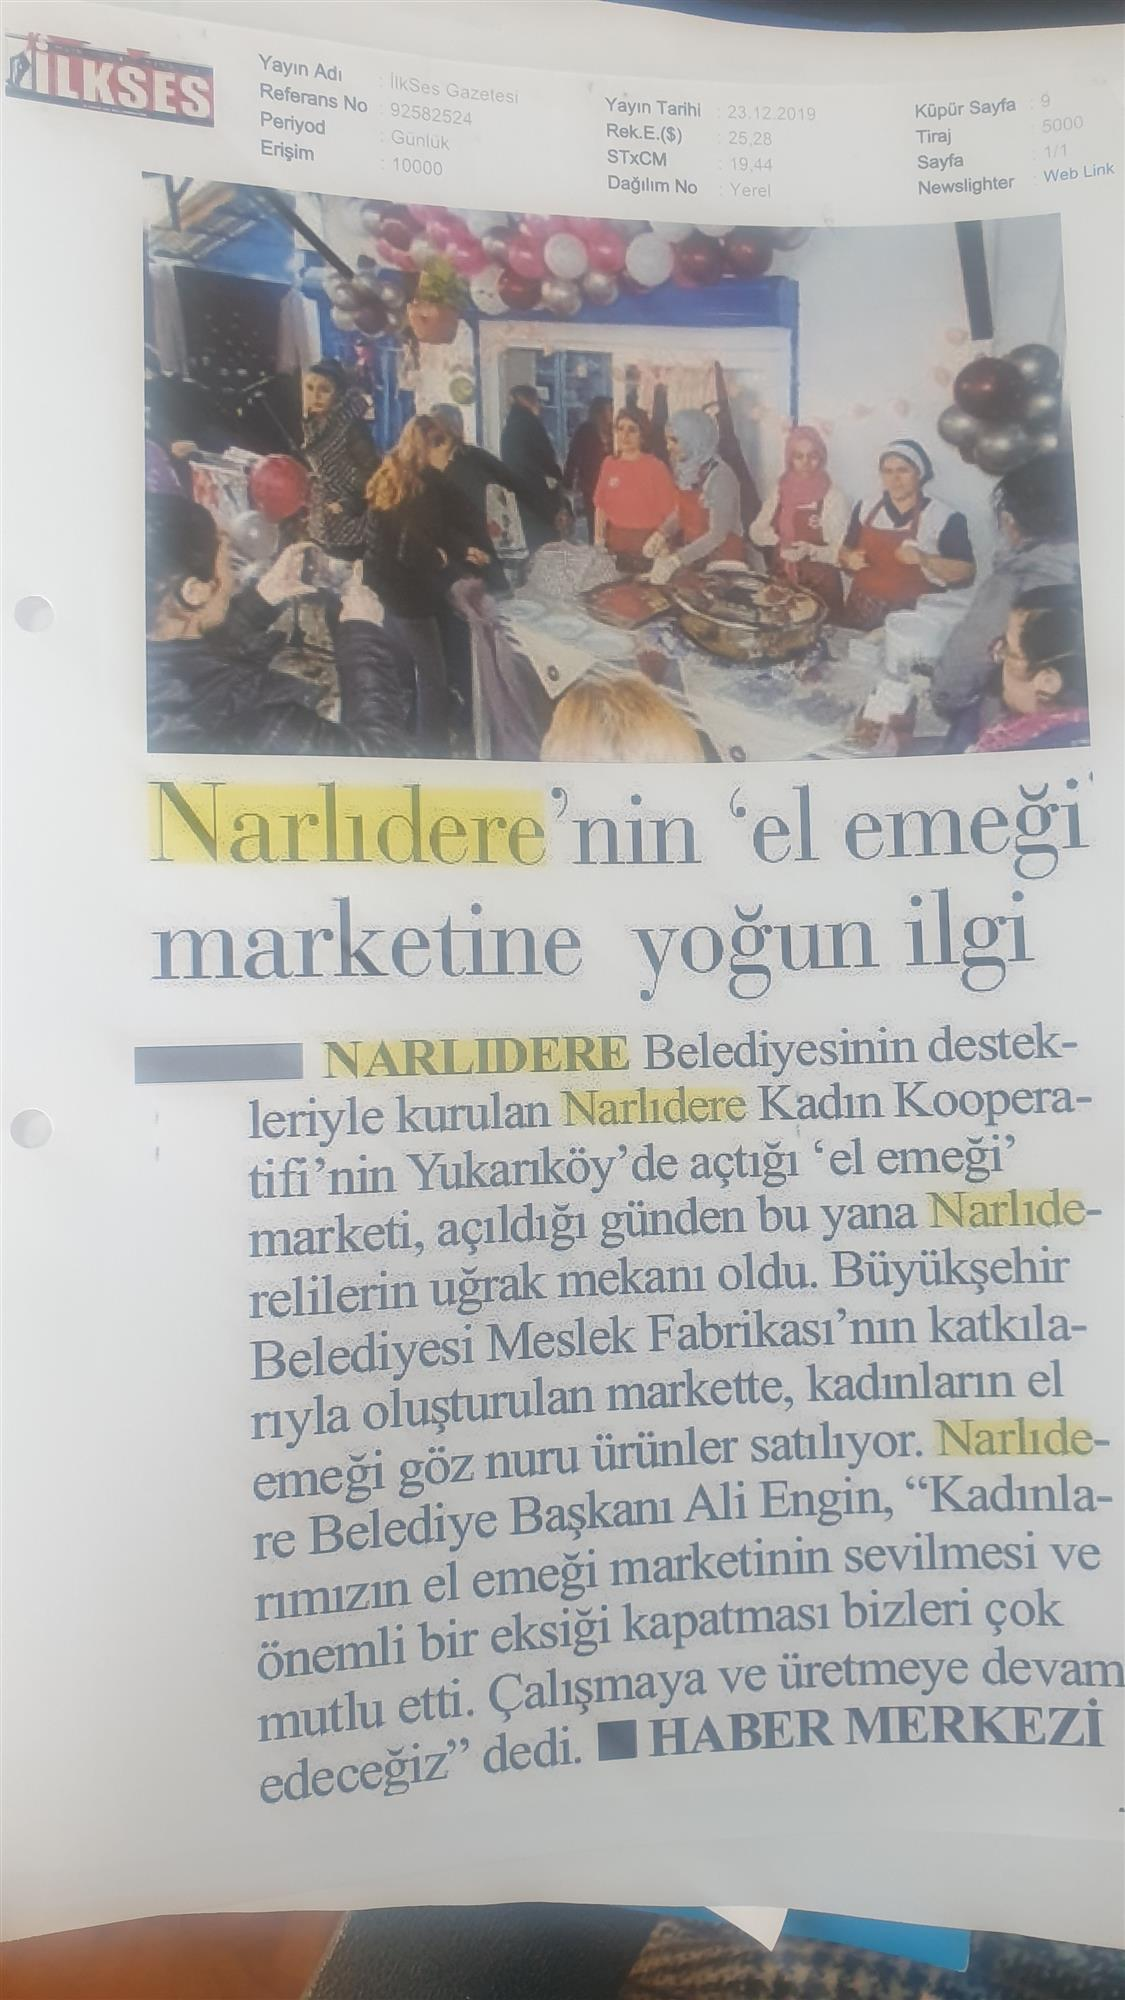 gazete-haberleri202012816343165